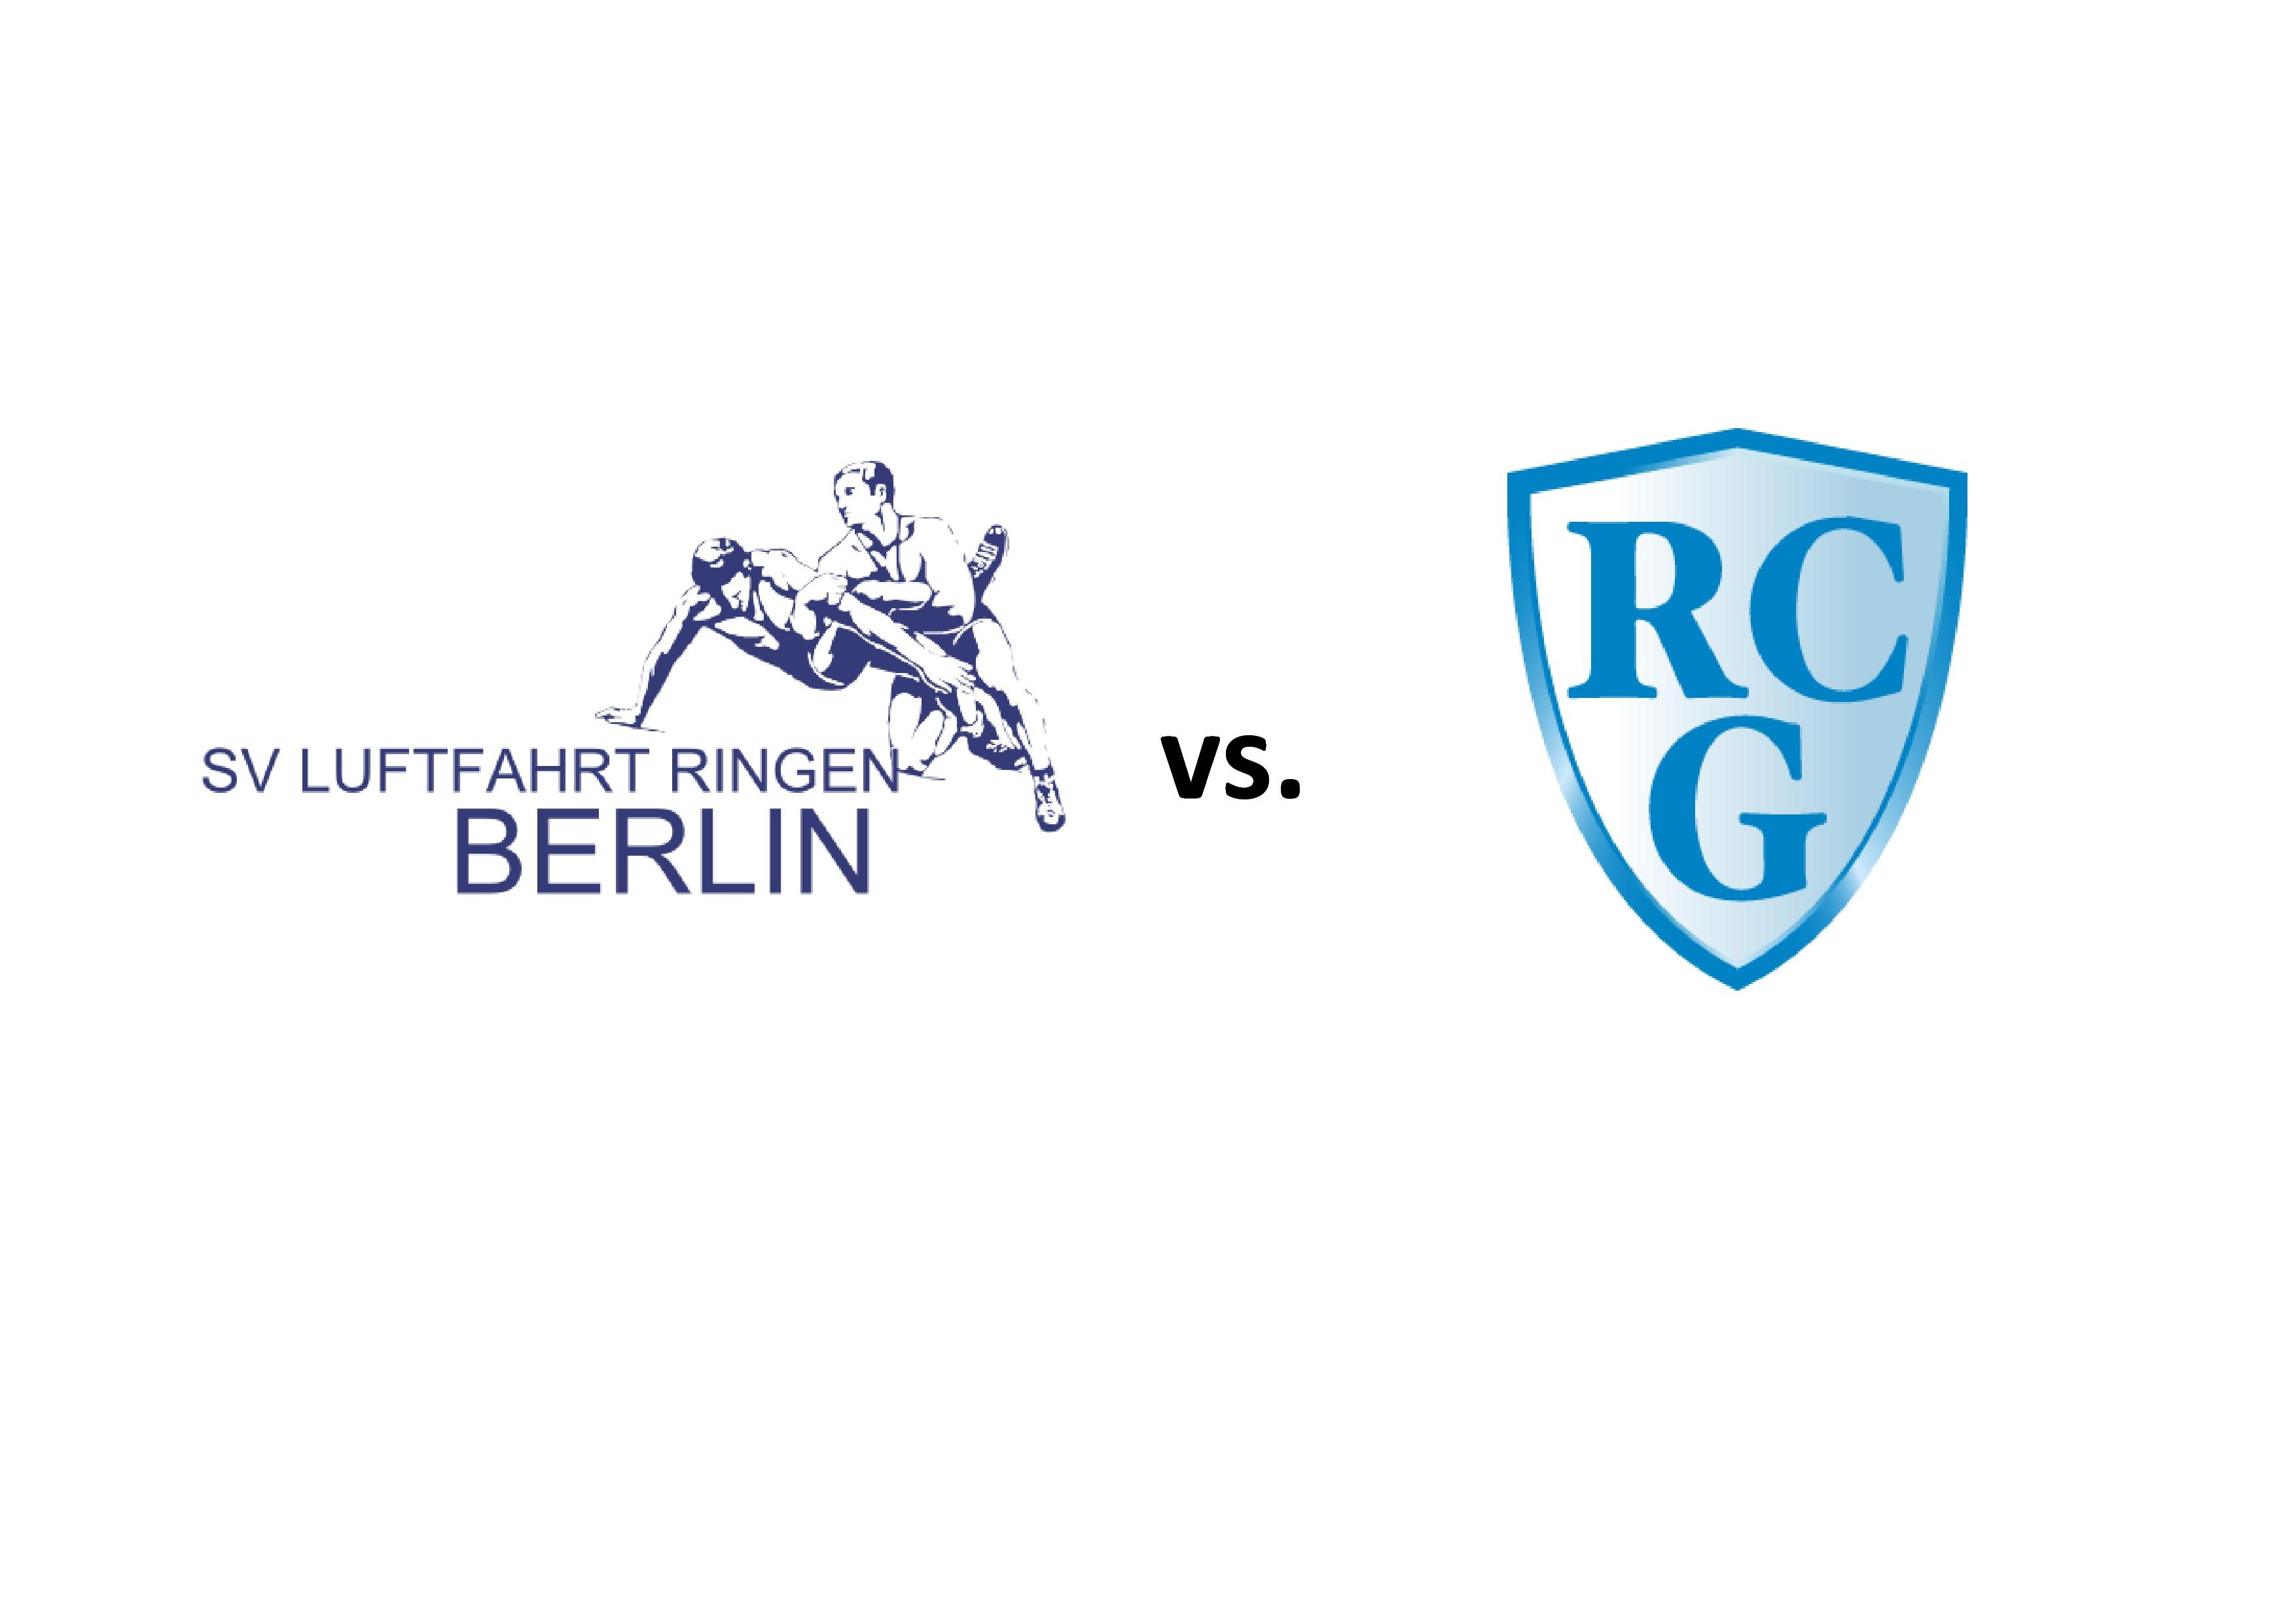 RL-Heimkampf SVL vs. RCG Potsdam